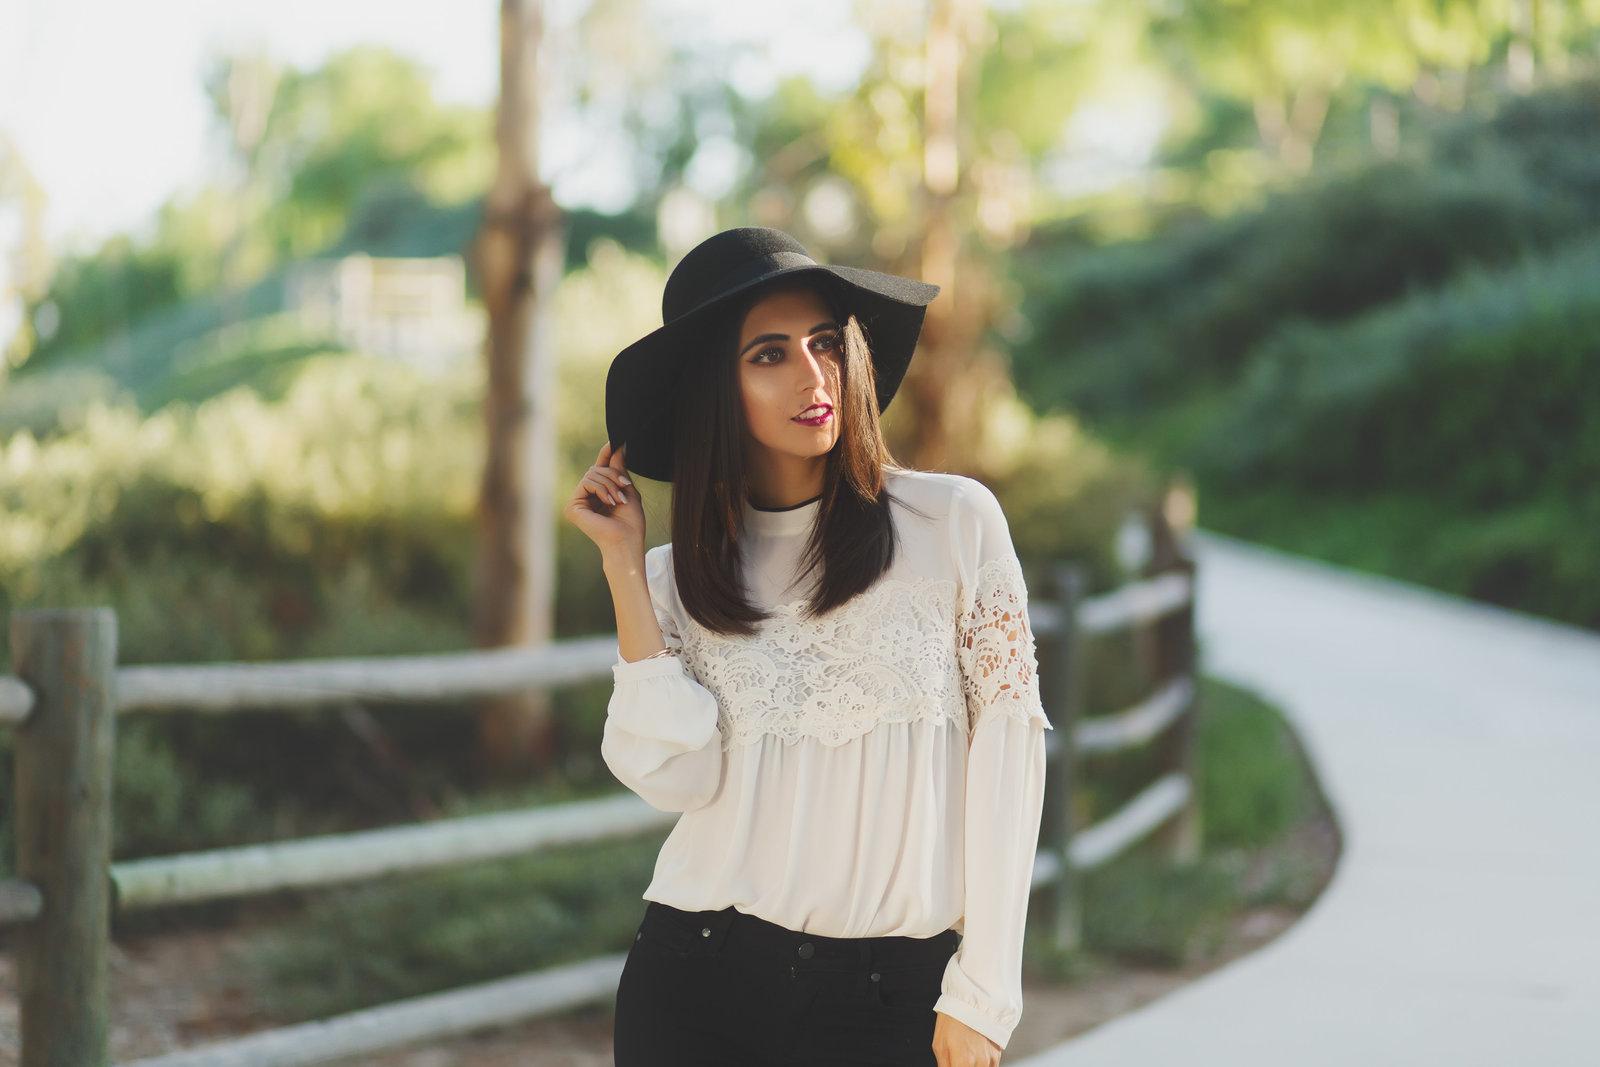 San_Diego_Professional_Portraits_Headshots_I_and_L_Photography-006